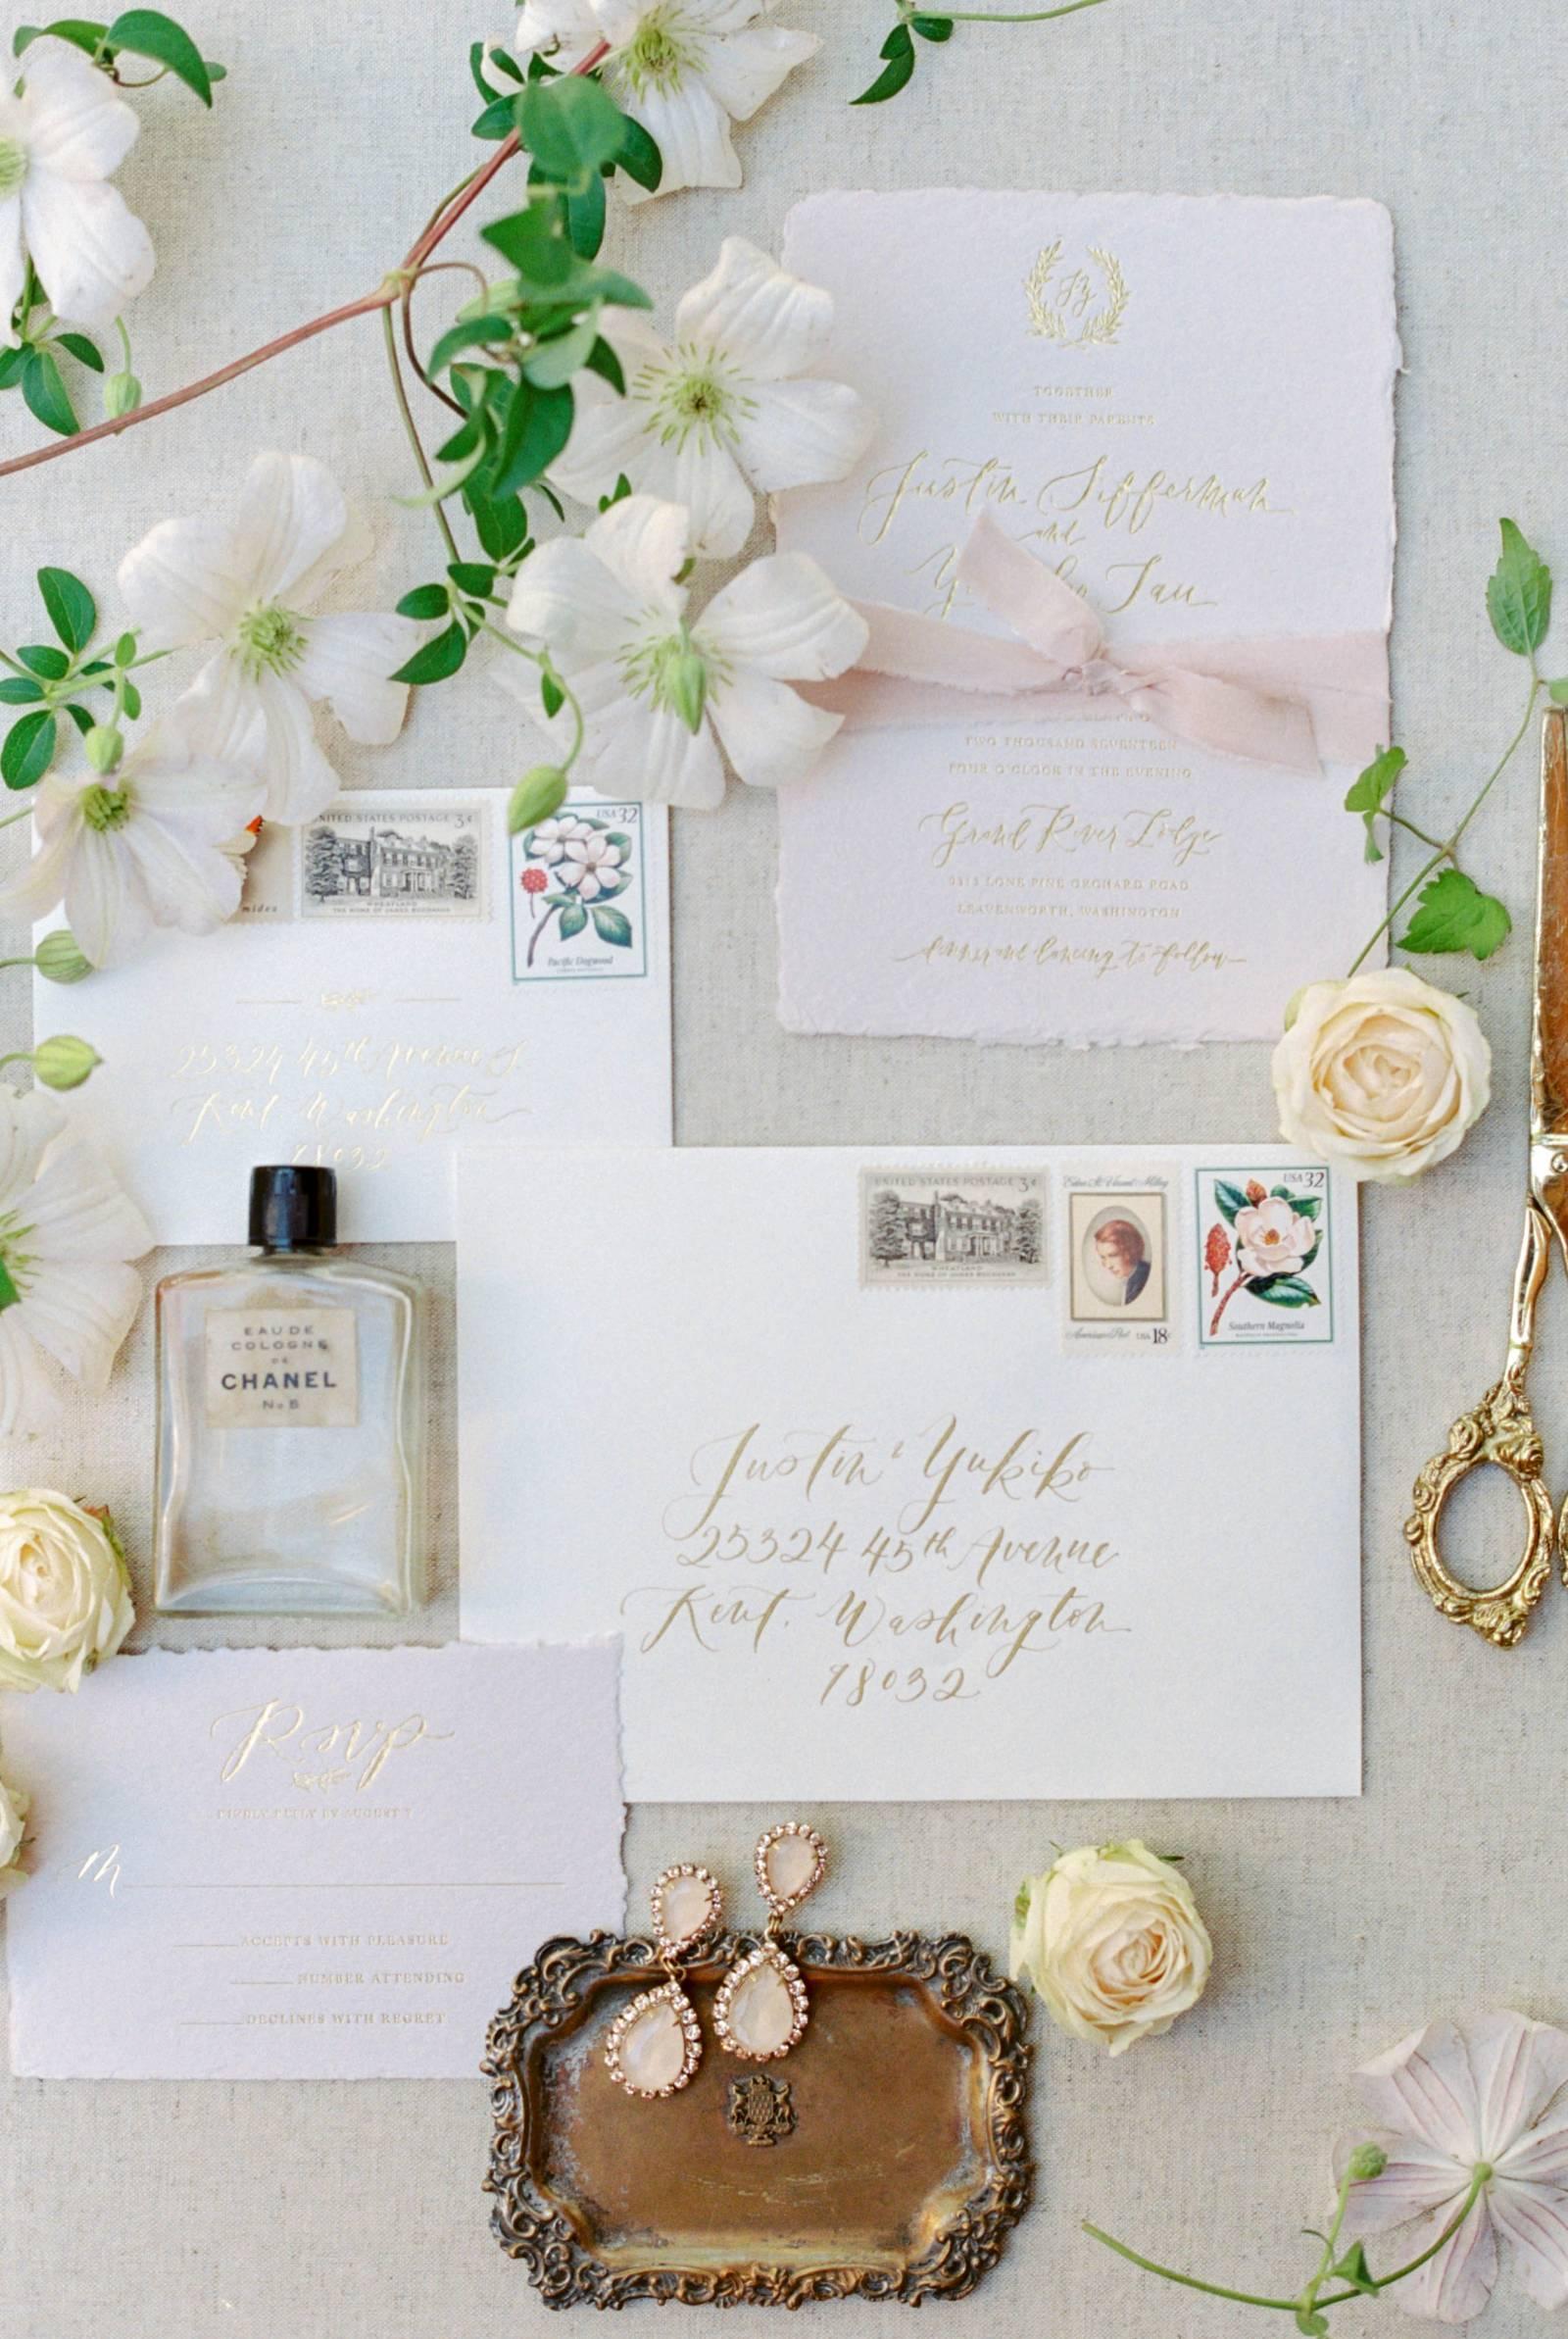 Luscious Summer Wedding in Eastern Washington | Washington Real Weddings